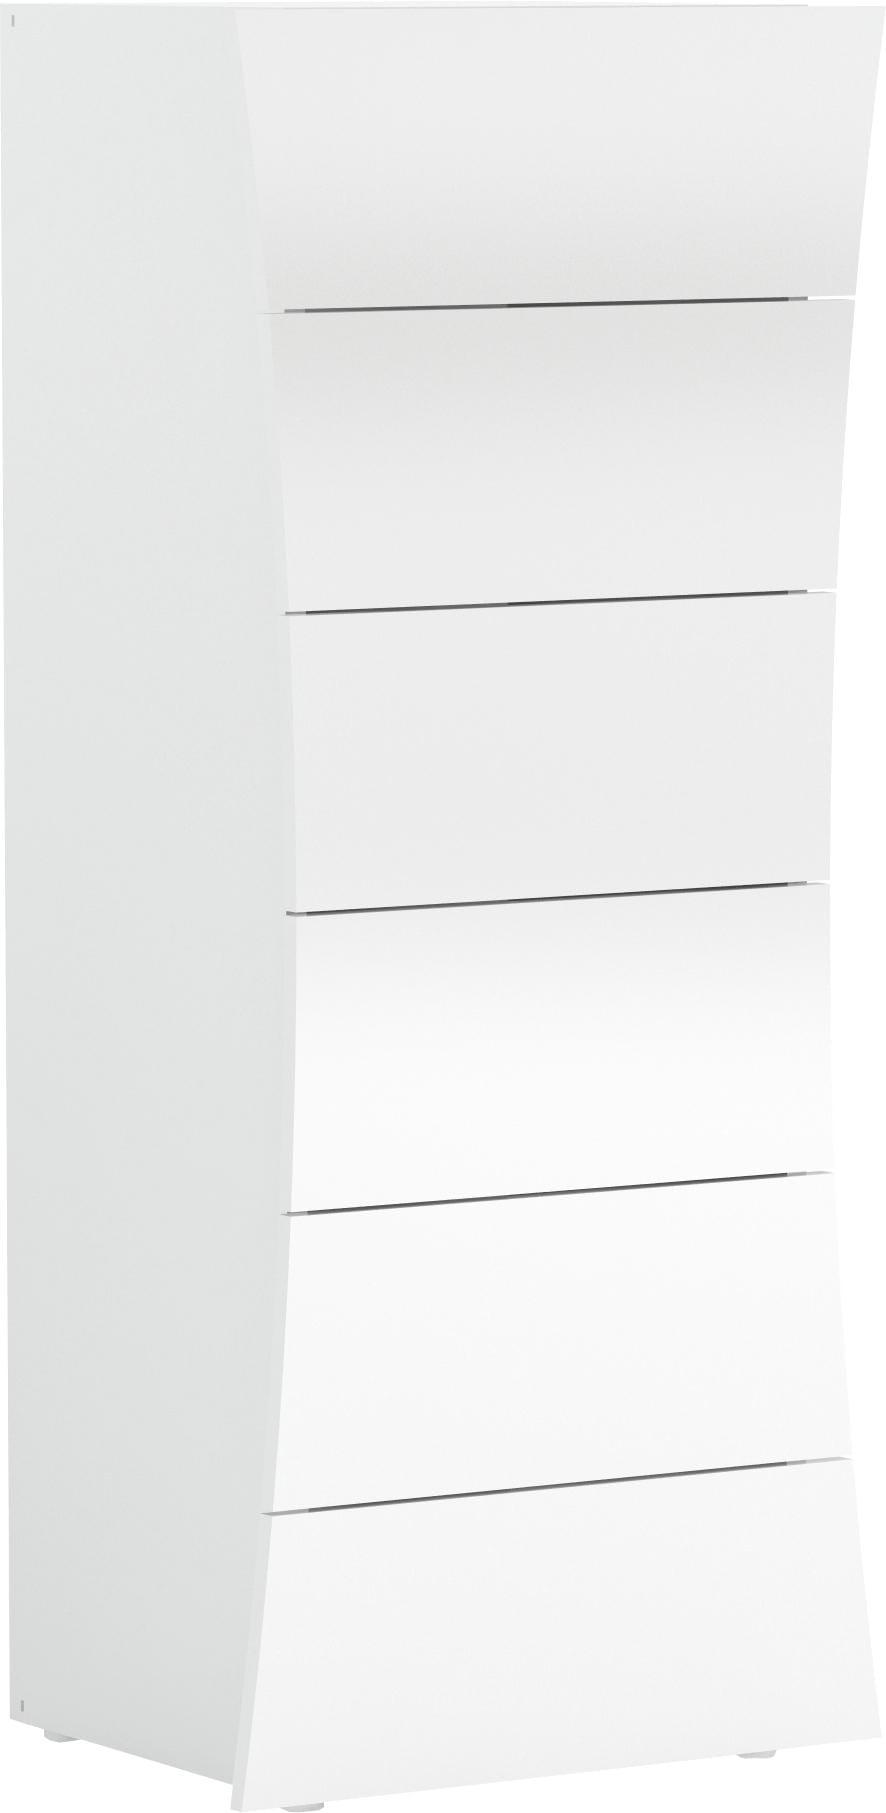 Kommode Arco Breite 50 cm